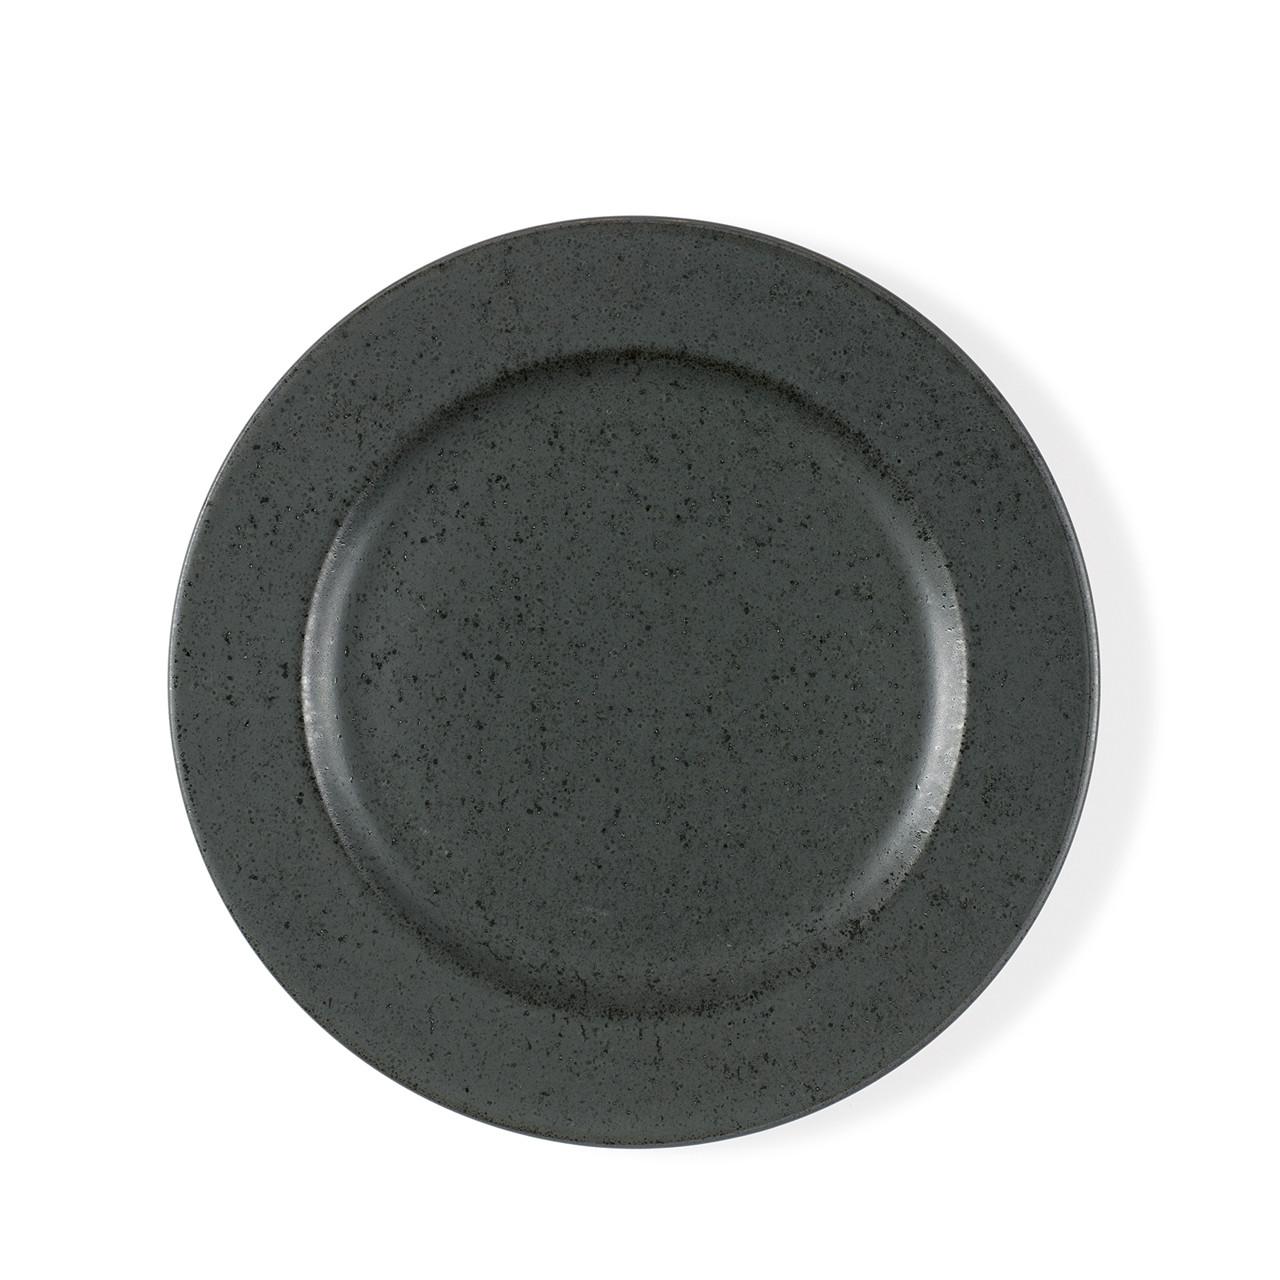 BITZ tallerken 22cm antracit sort stentøj » Køb her